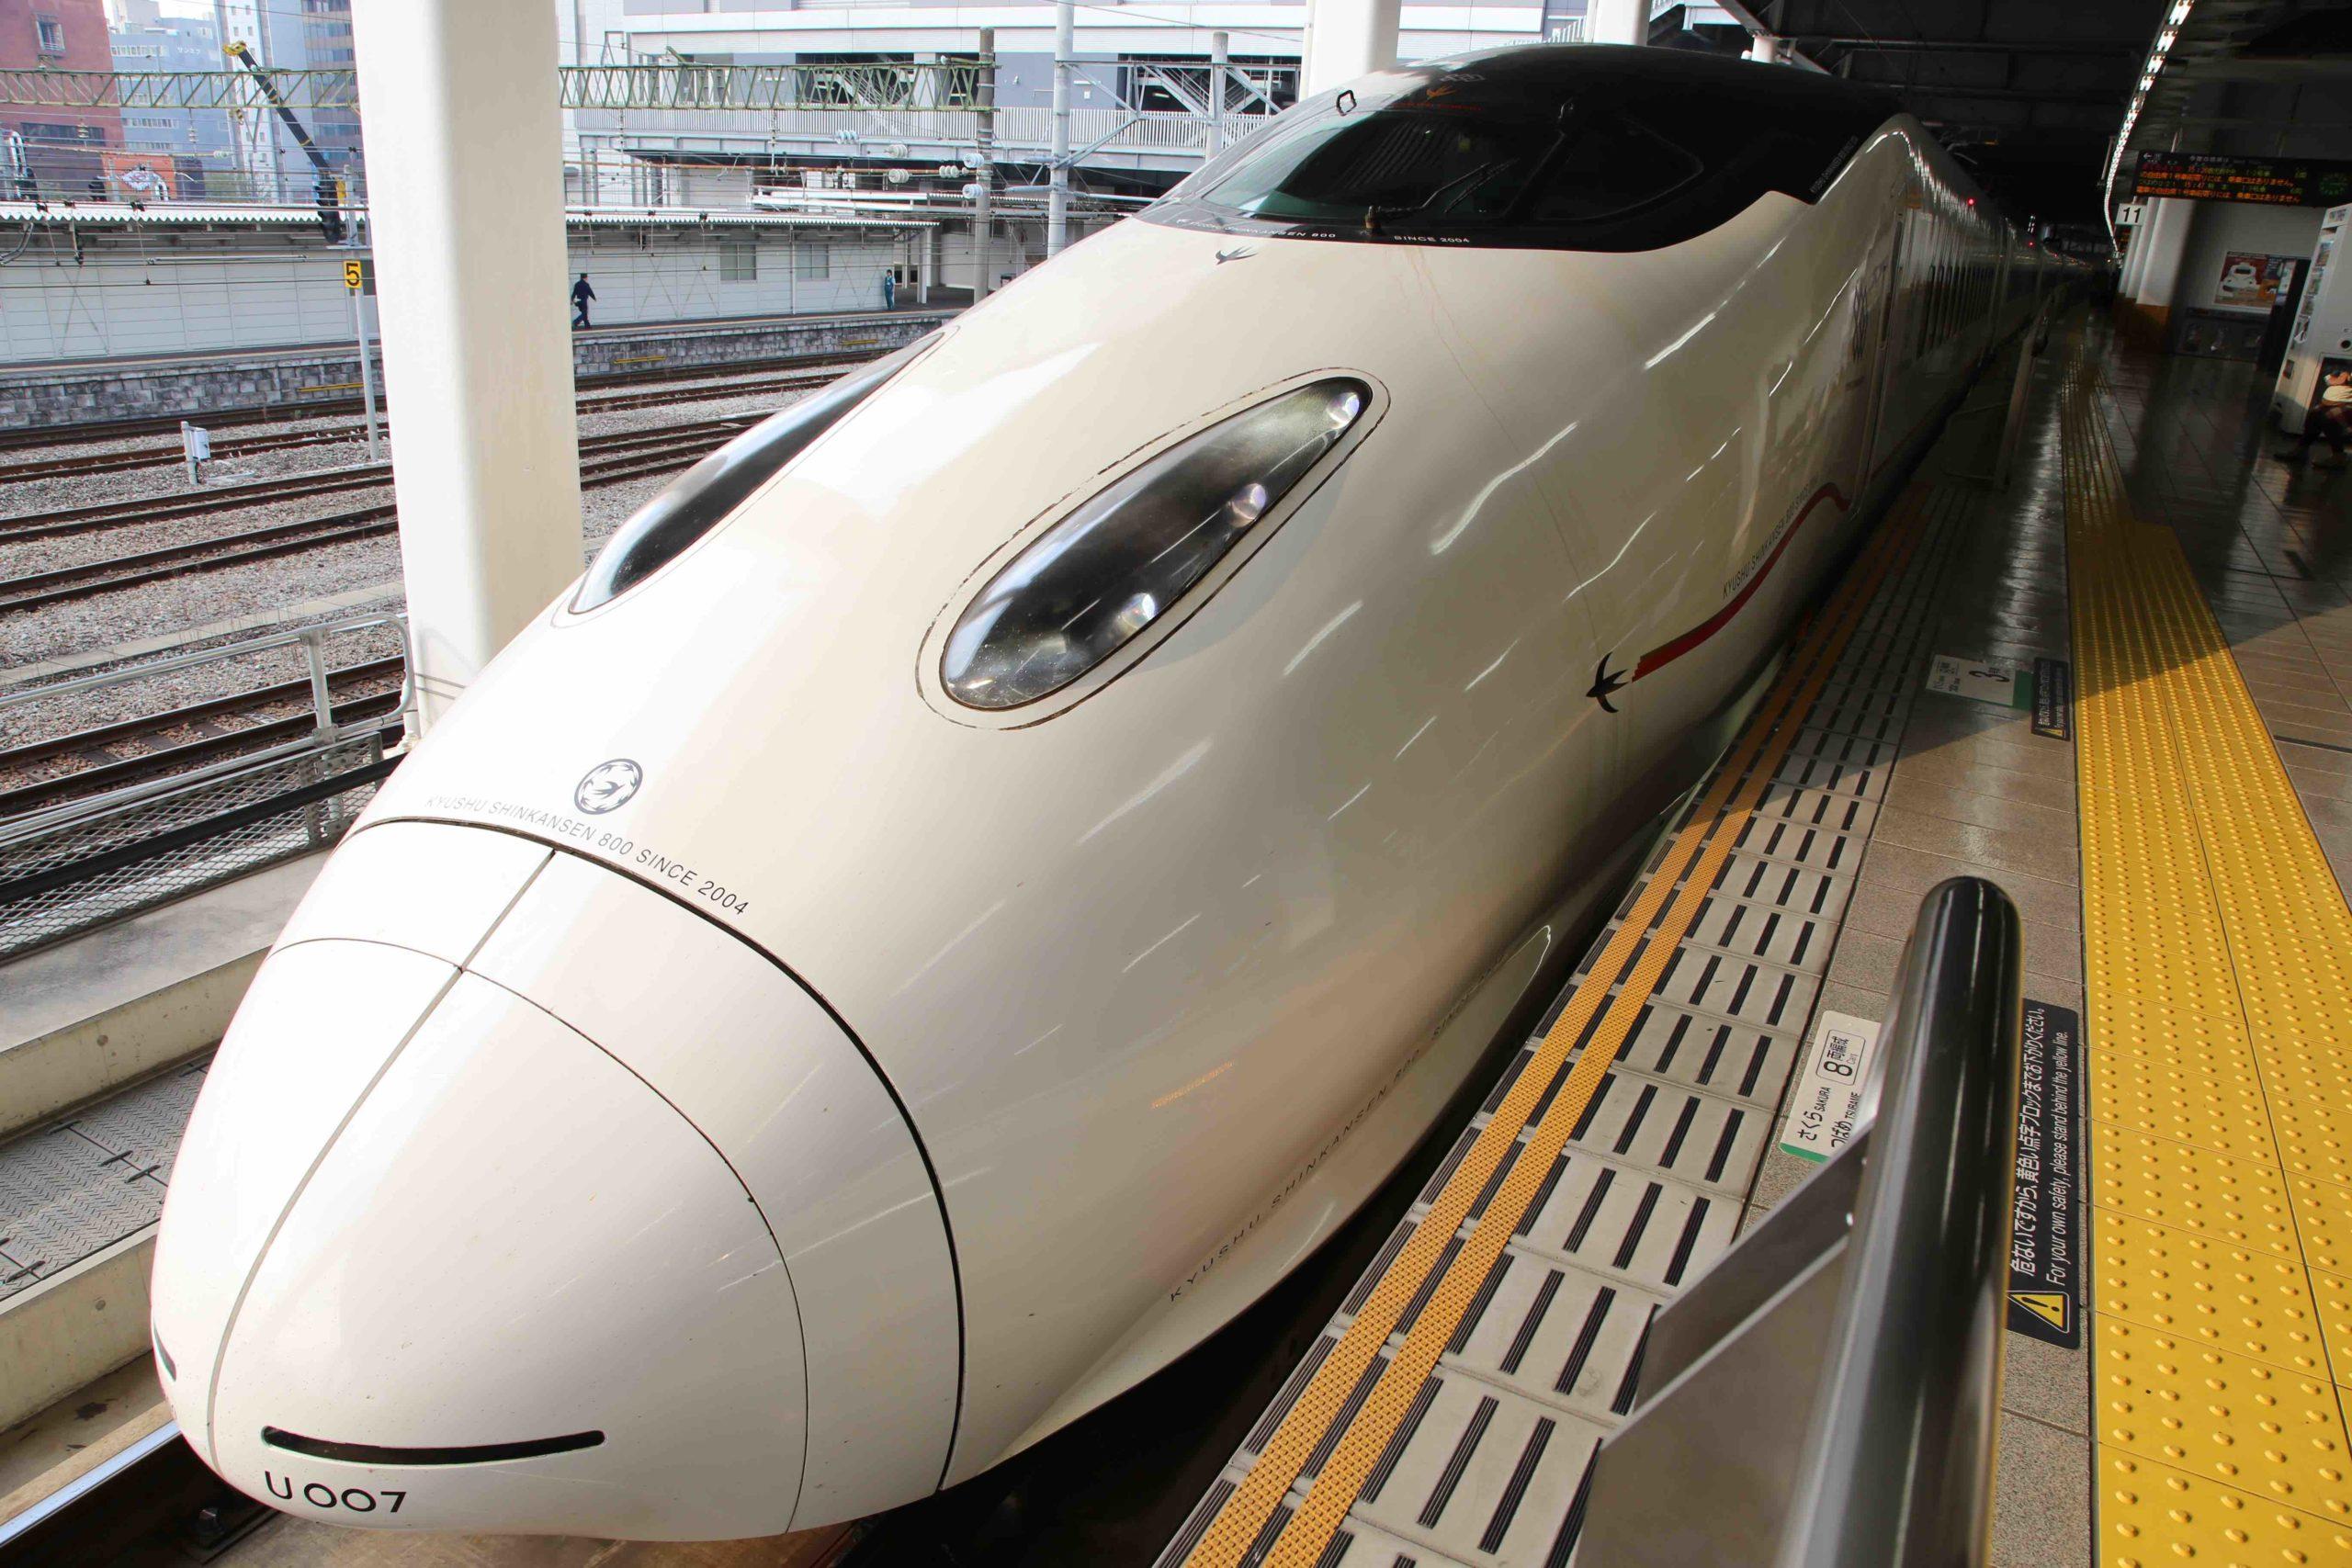 Kyushu_Shinkansenl_183027 copy